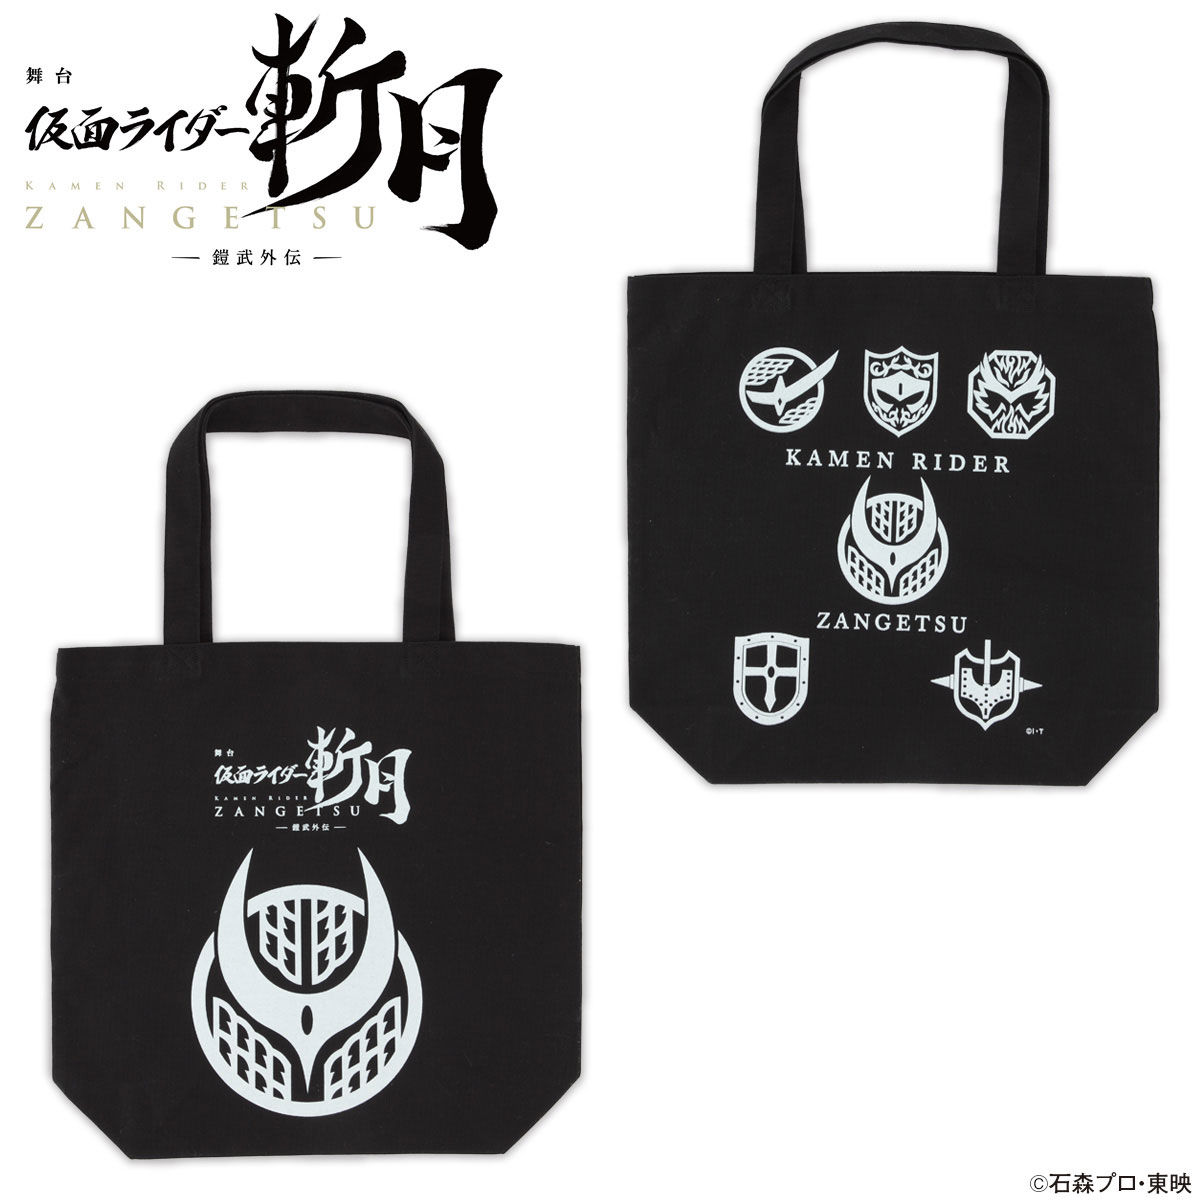 "Stage show ""KAMEN RIDER ZANGETSU"" -Gaim Gaiden- tote bag"